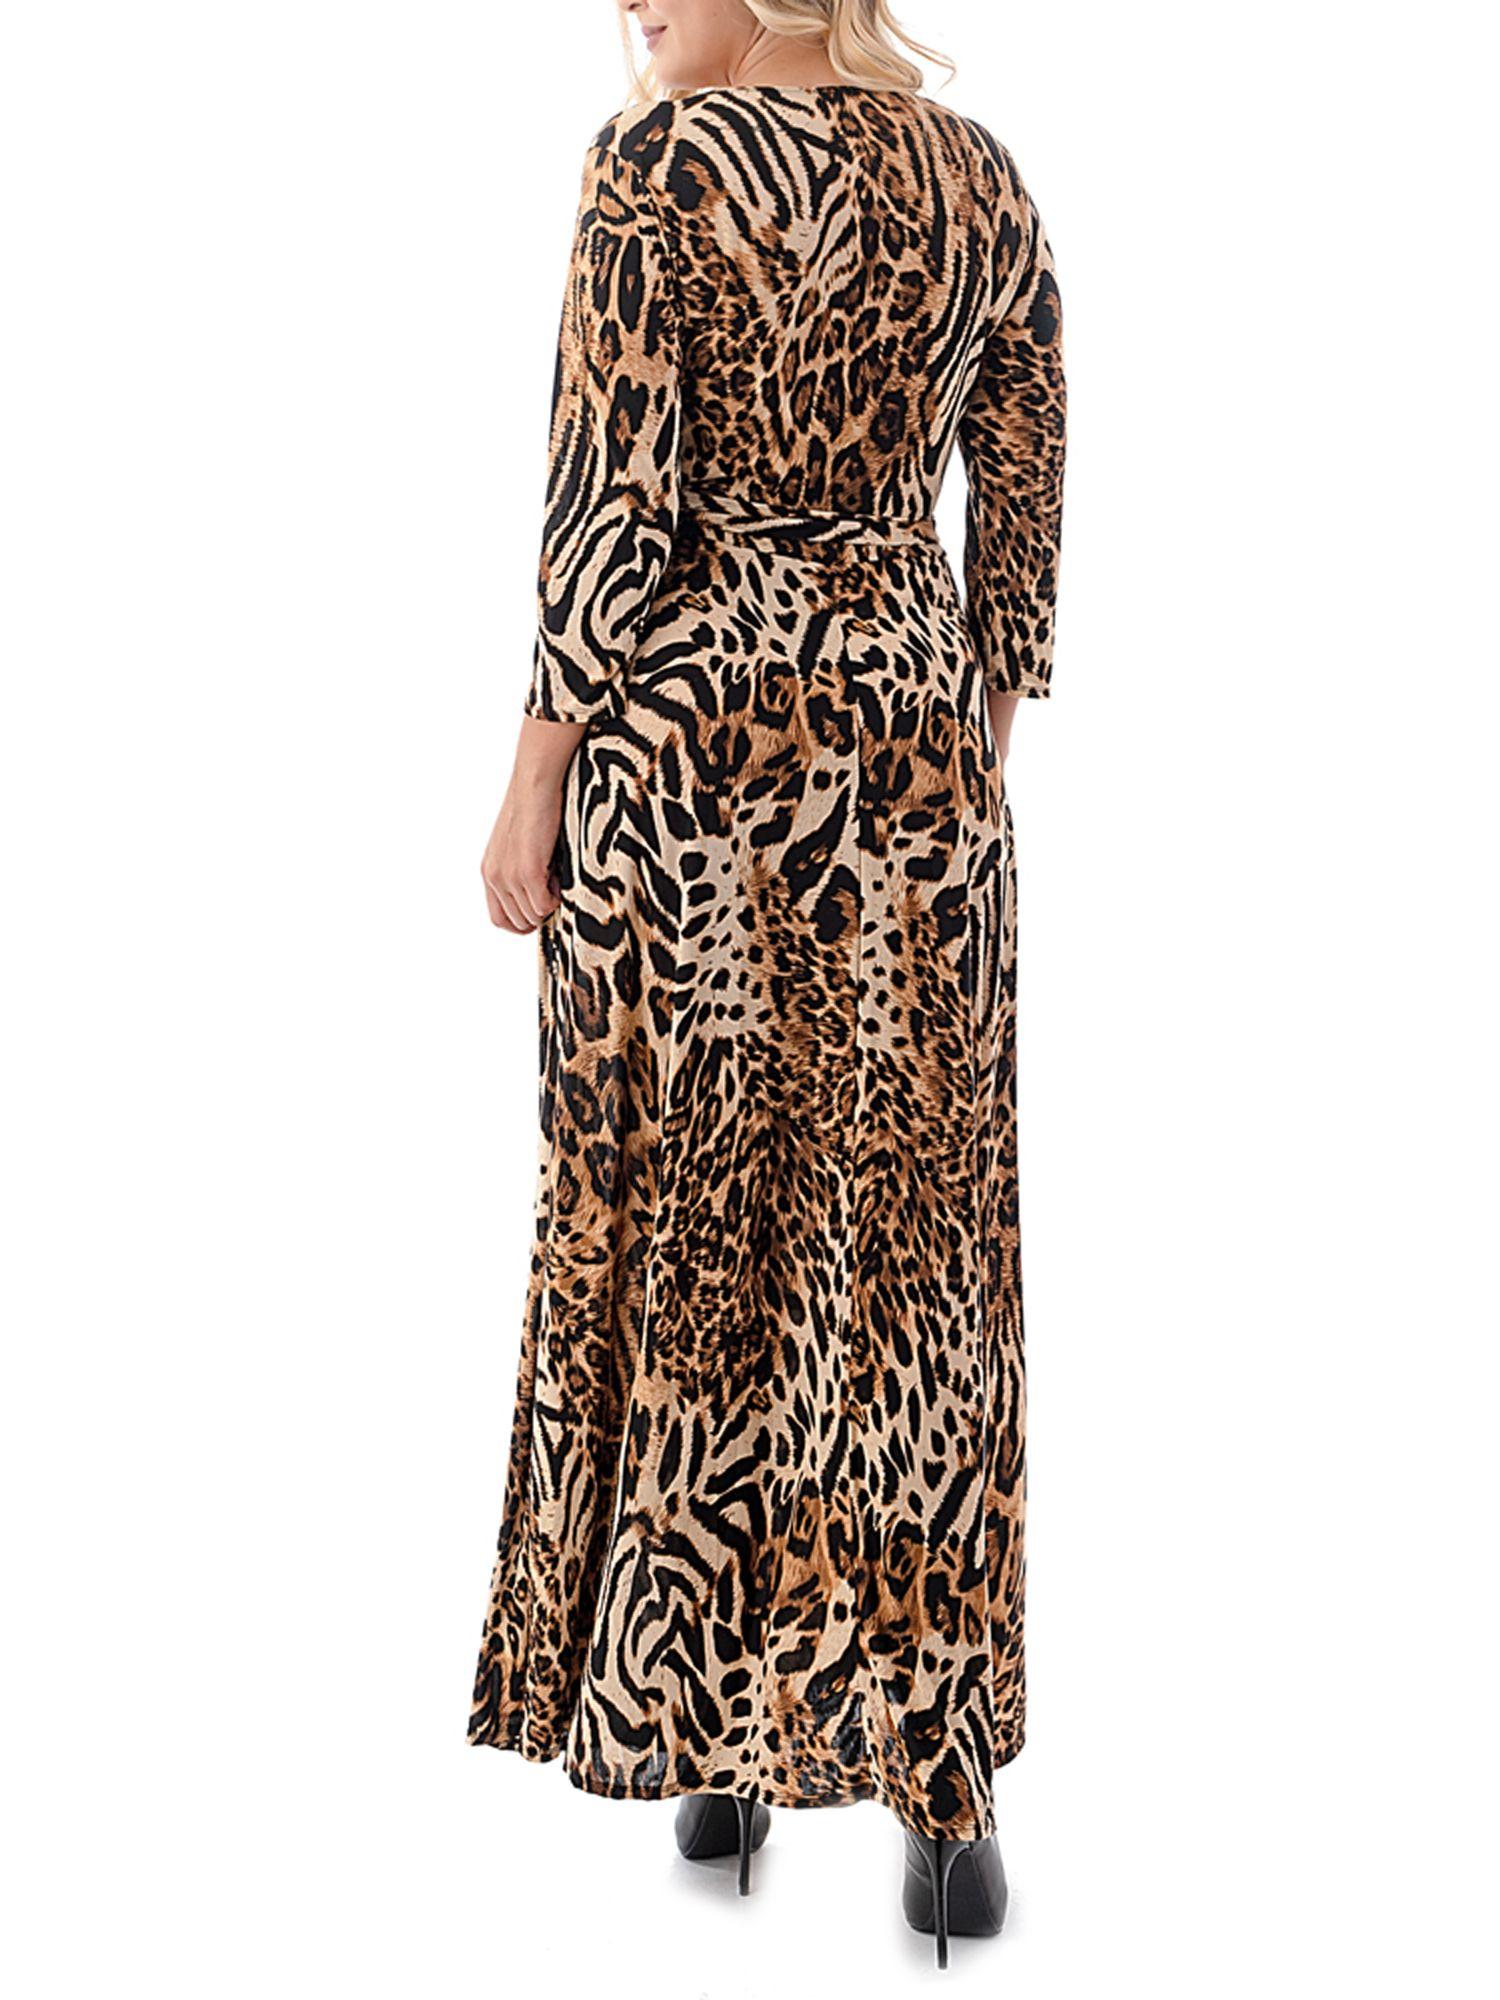 Ella Samani Ella Samani Women S Plus Size Faux Wrap Maxi Dress Walmart Com Maxi Wrap Dress Maxi Dress Dresses [ 2000 x 1500 Pixel ]